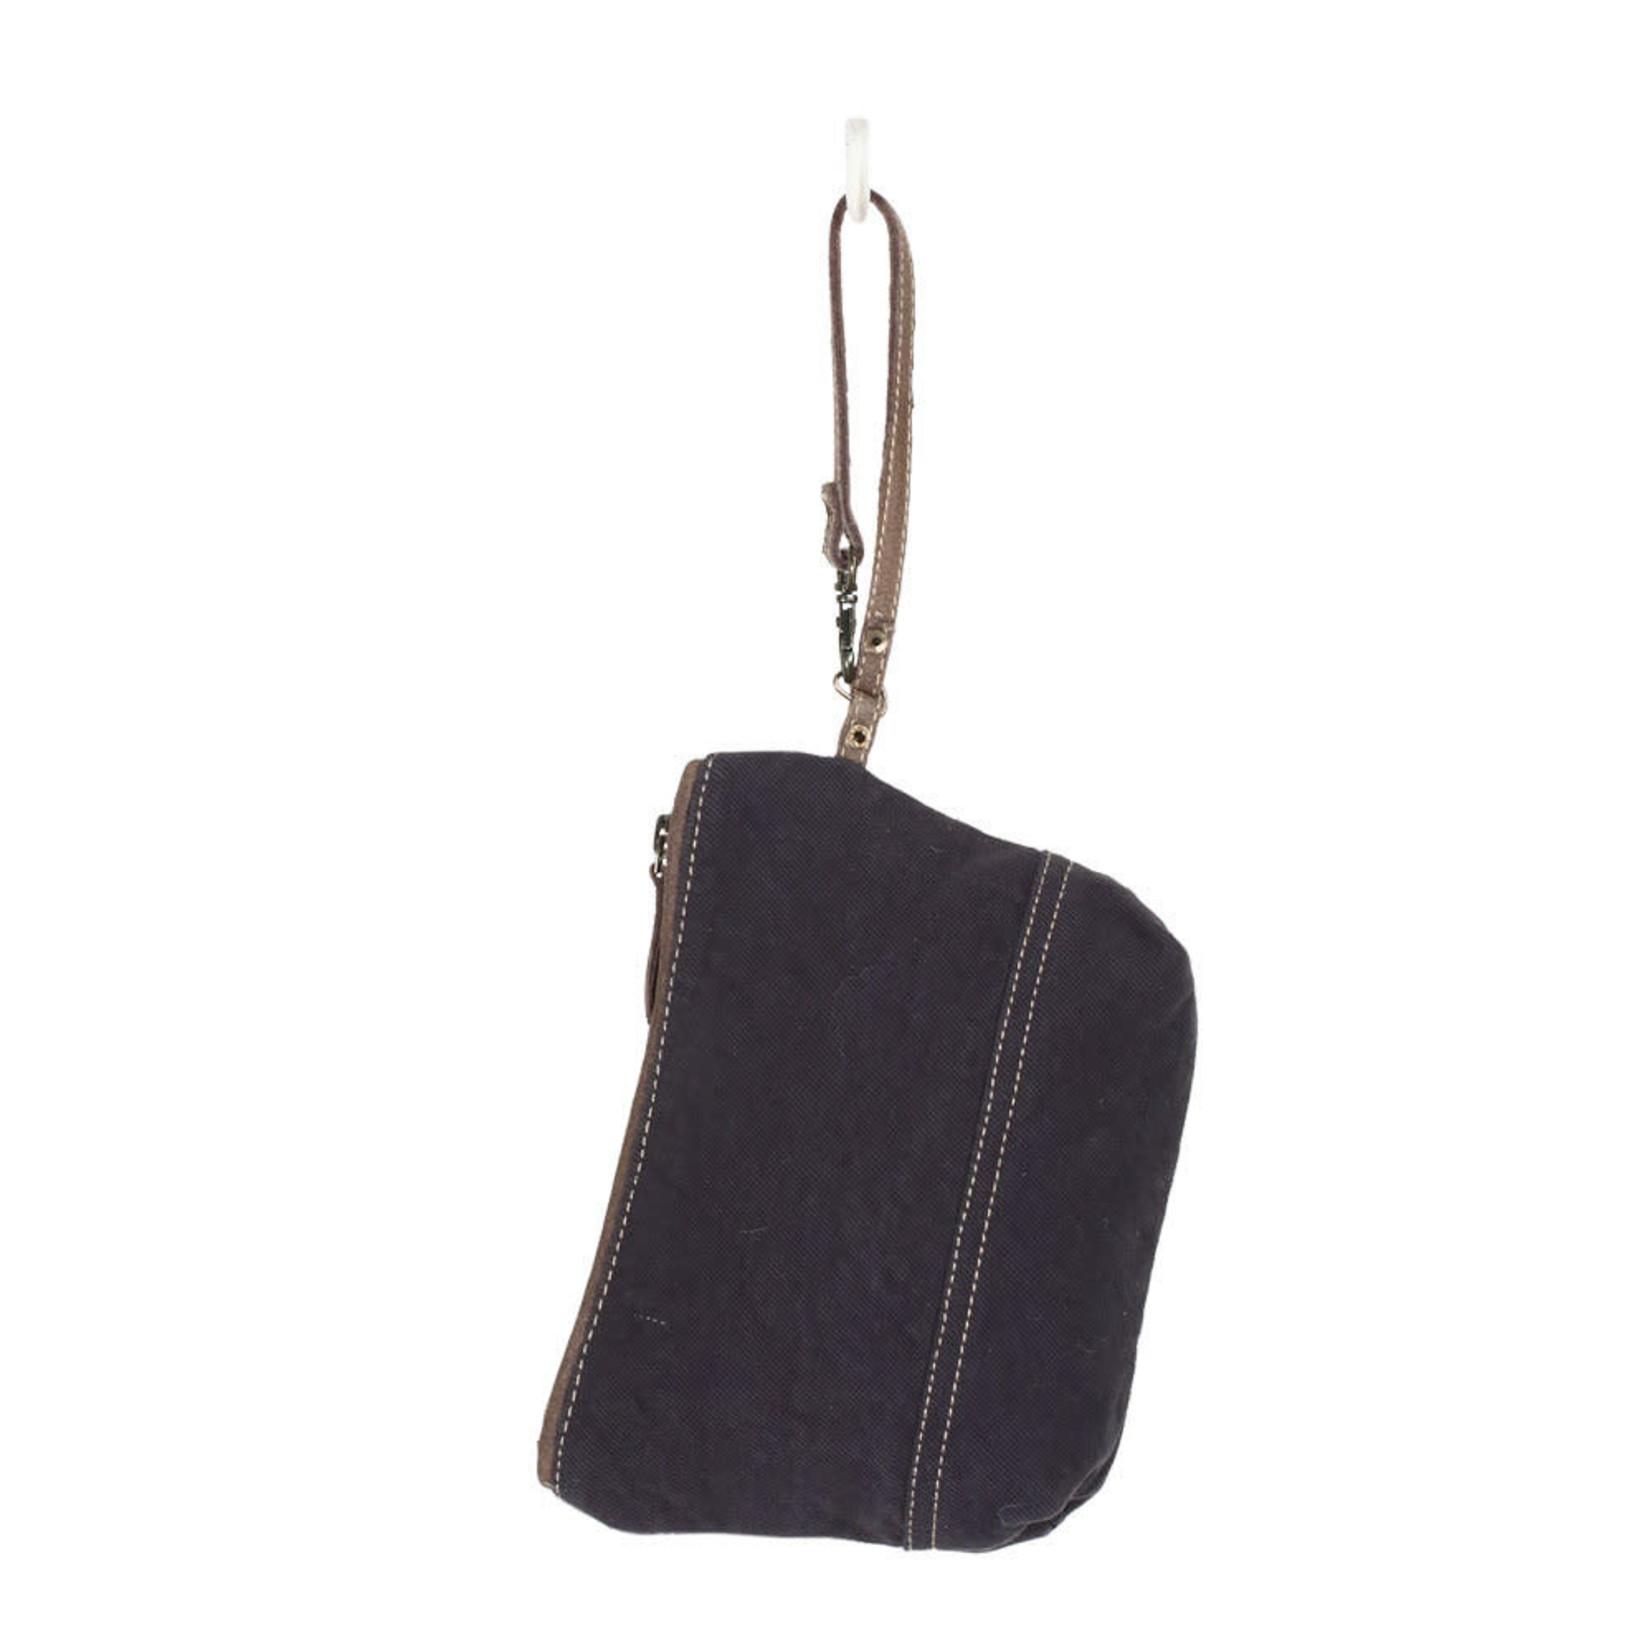 Myra Bags S-1321 Kilim Classical Design Pouch Wristlet